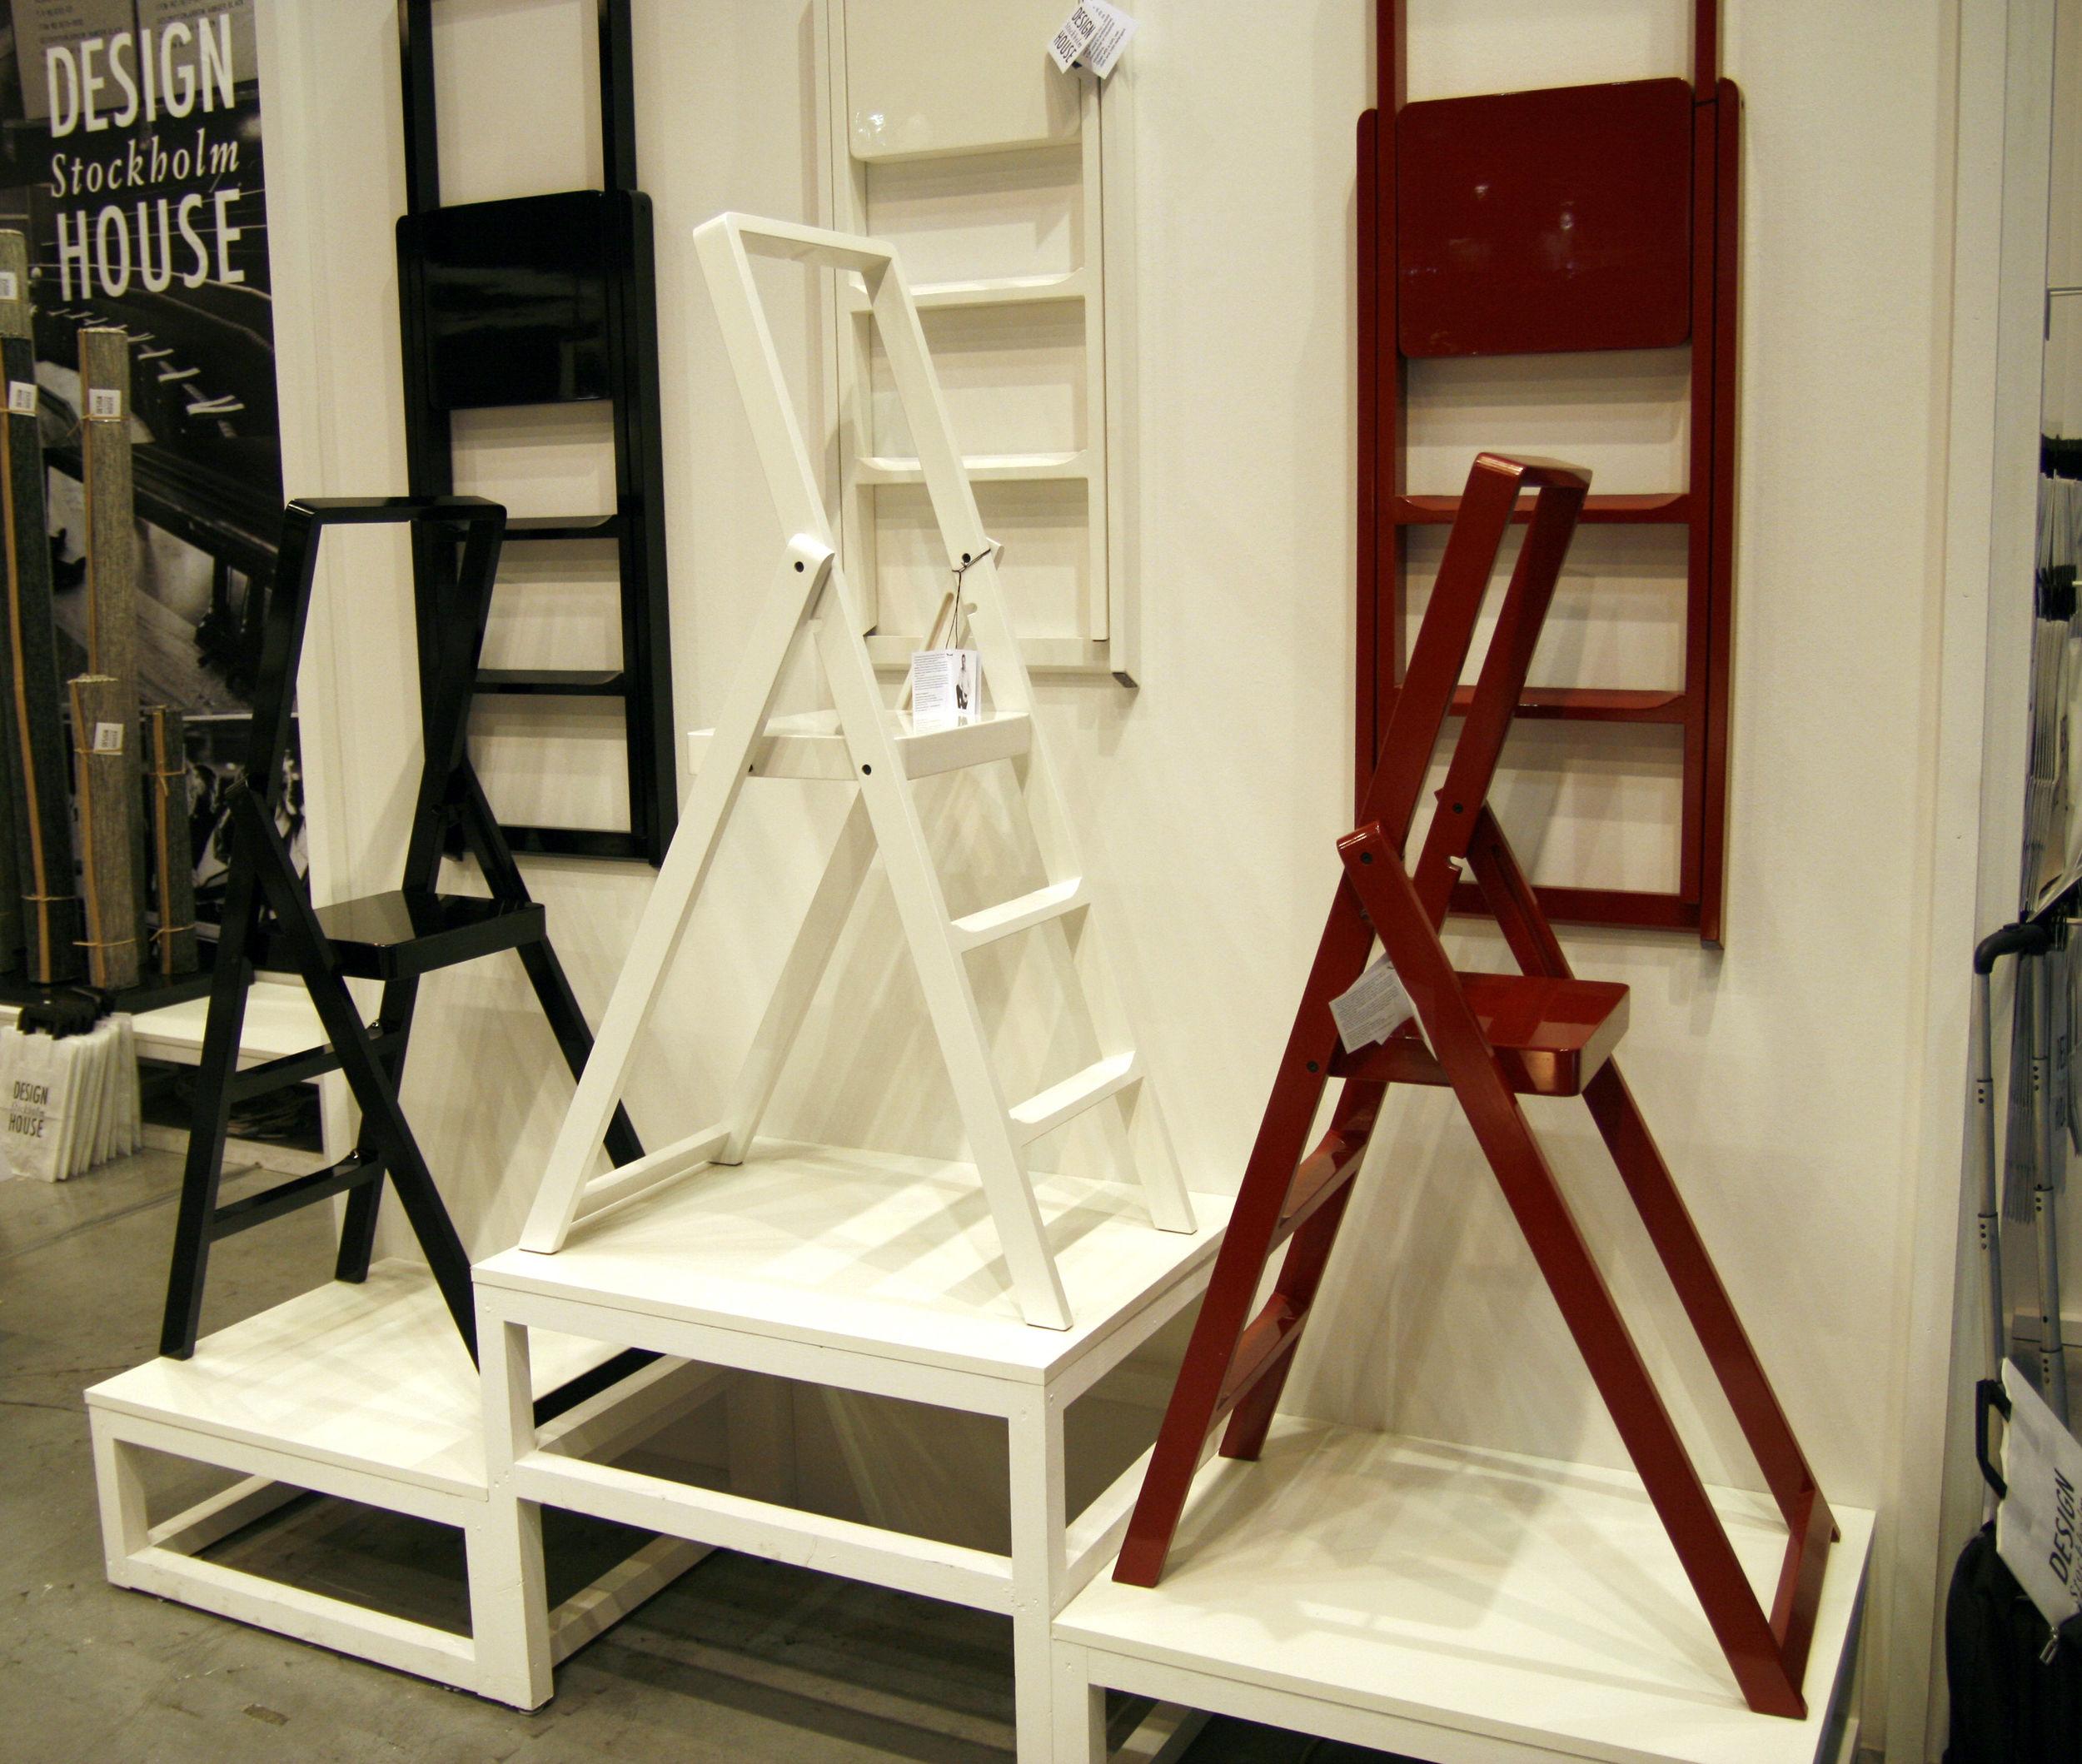 escabeau step pliable h 66 cm noir design house stockholm. Black Bedroom Furniture Sets. Home Design Ideas